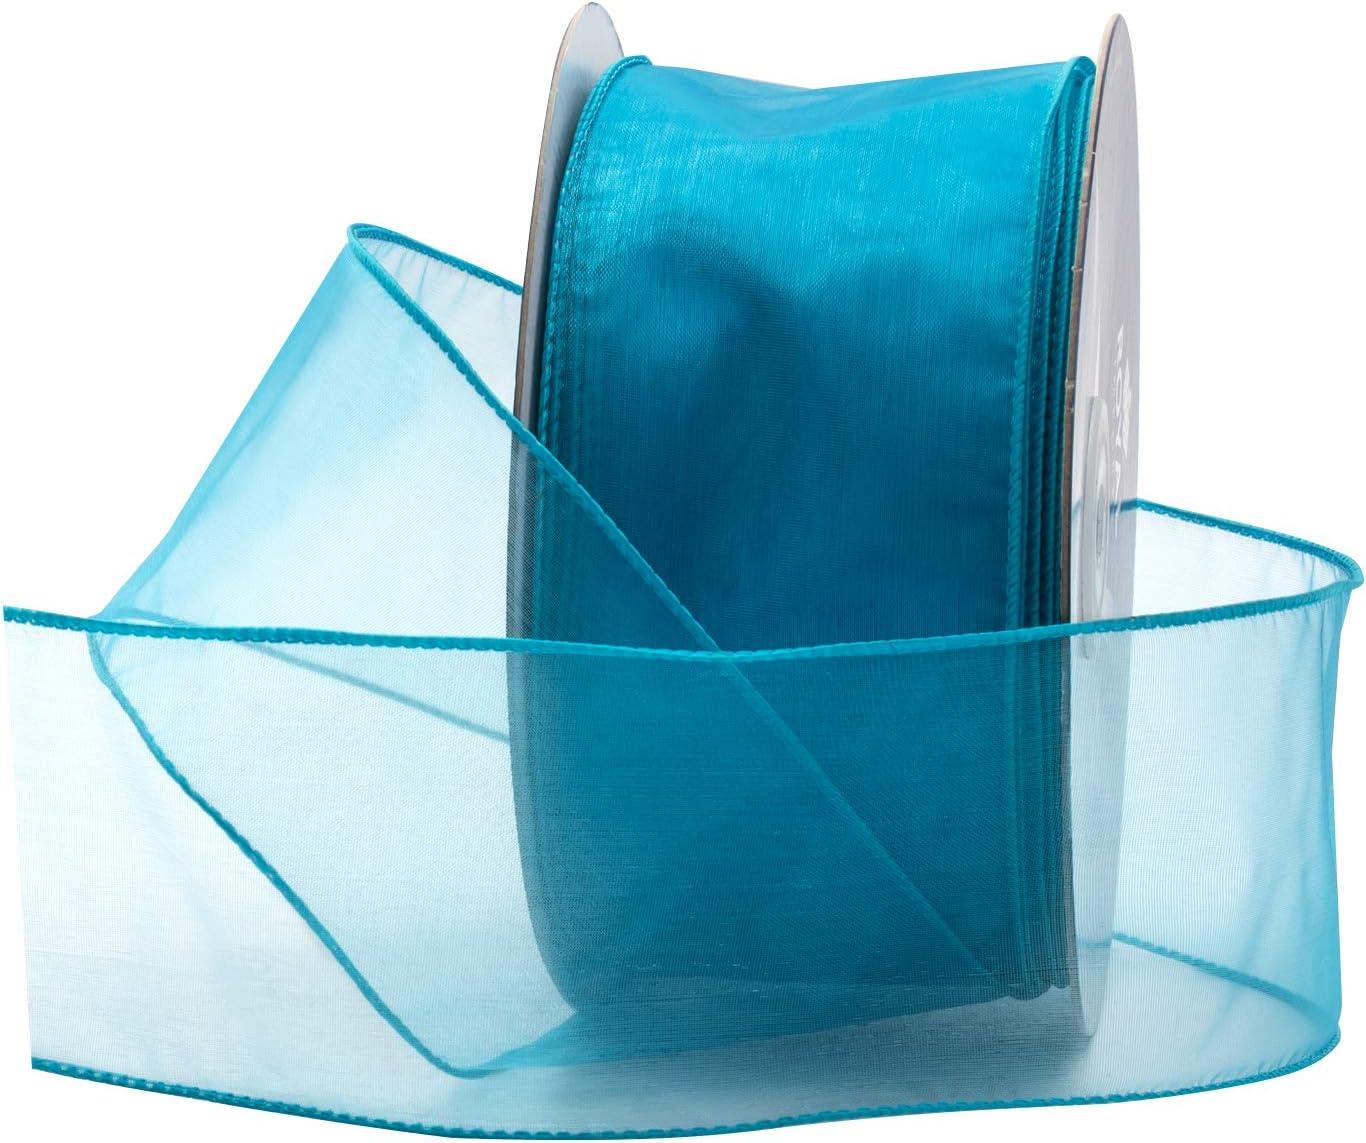 50 Yards dark blue Sheer Organza Ribbon 20mm Wide S4054